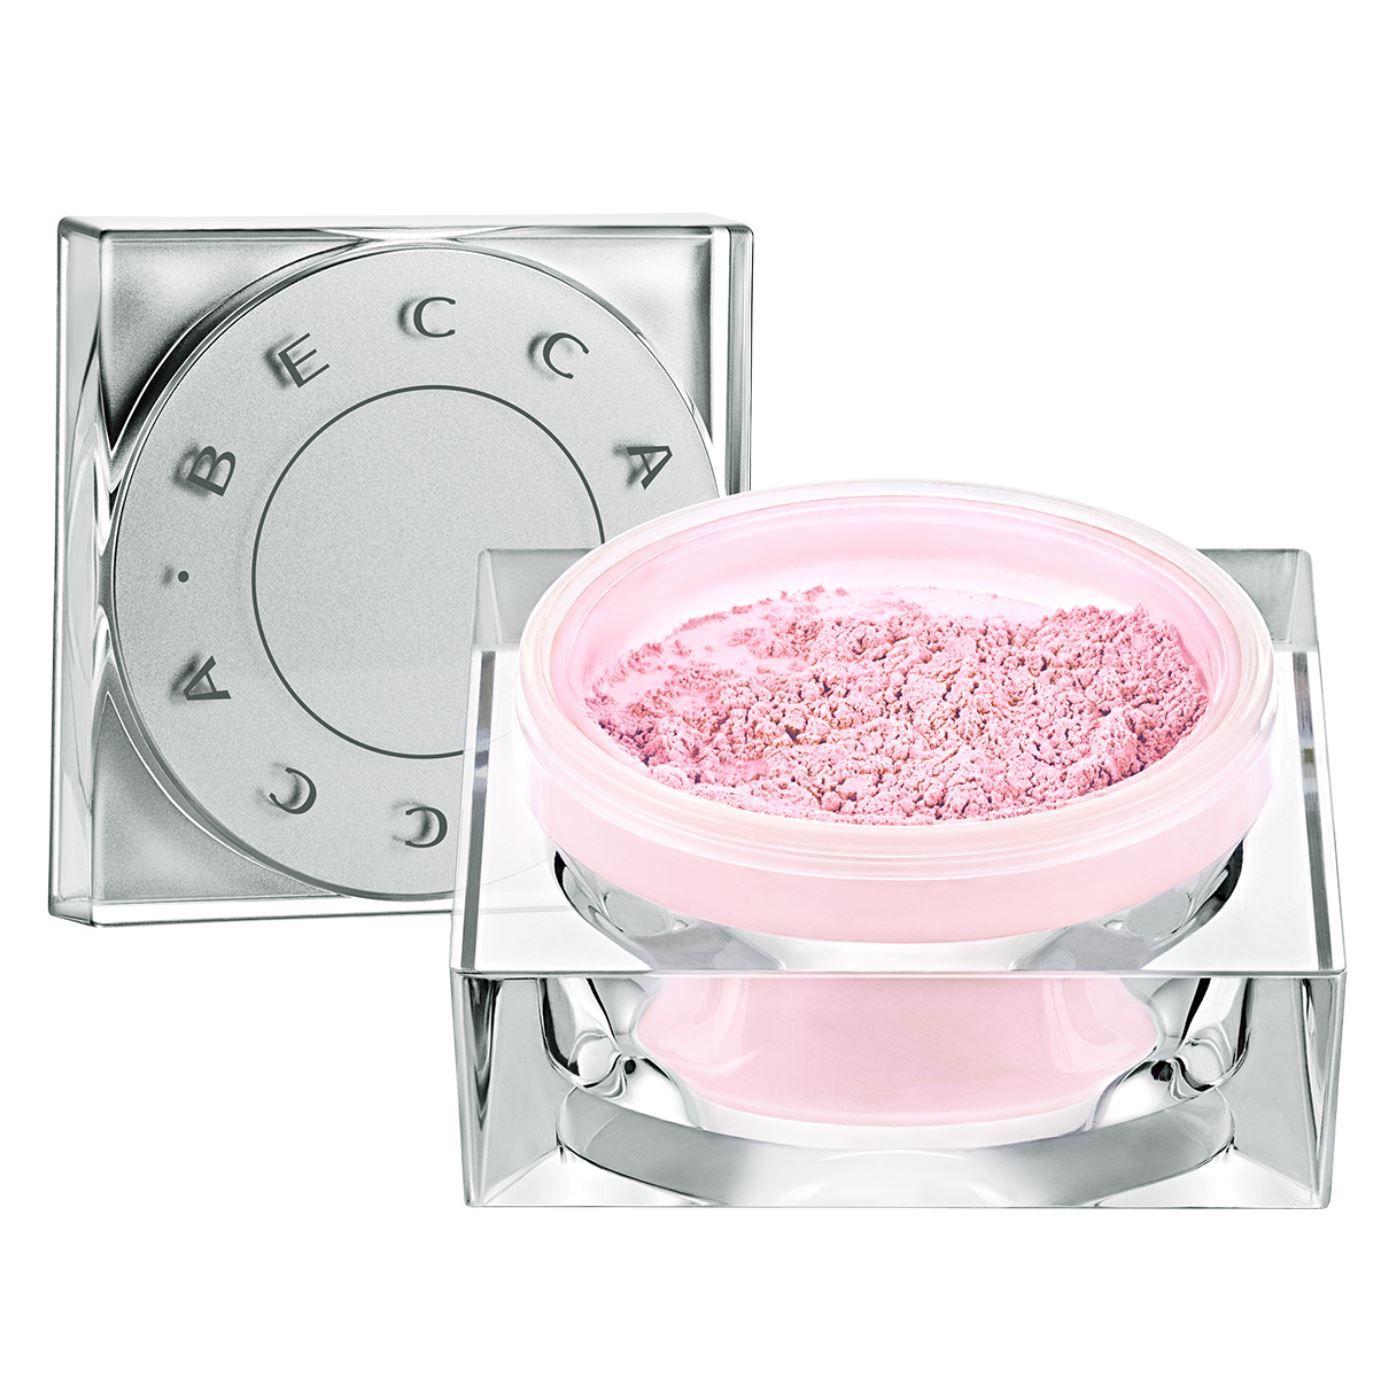 Becca Soft Light Blurring Setting Powder Pink Haze